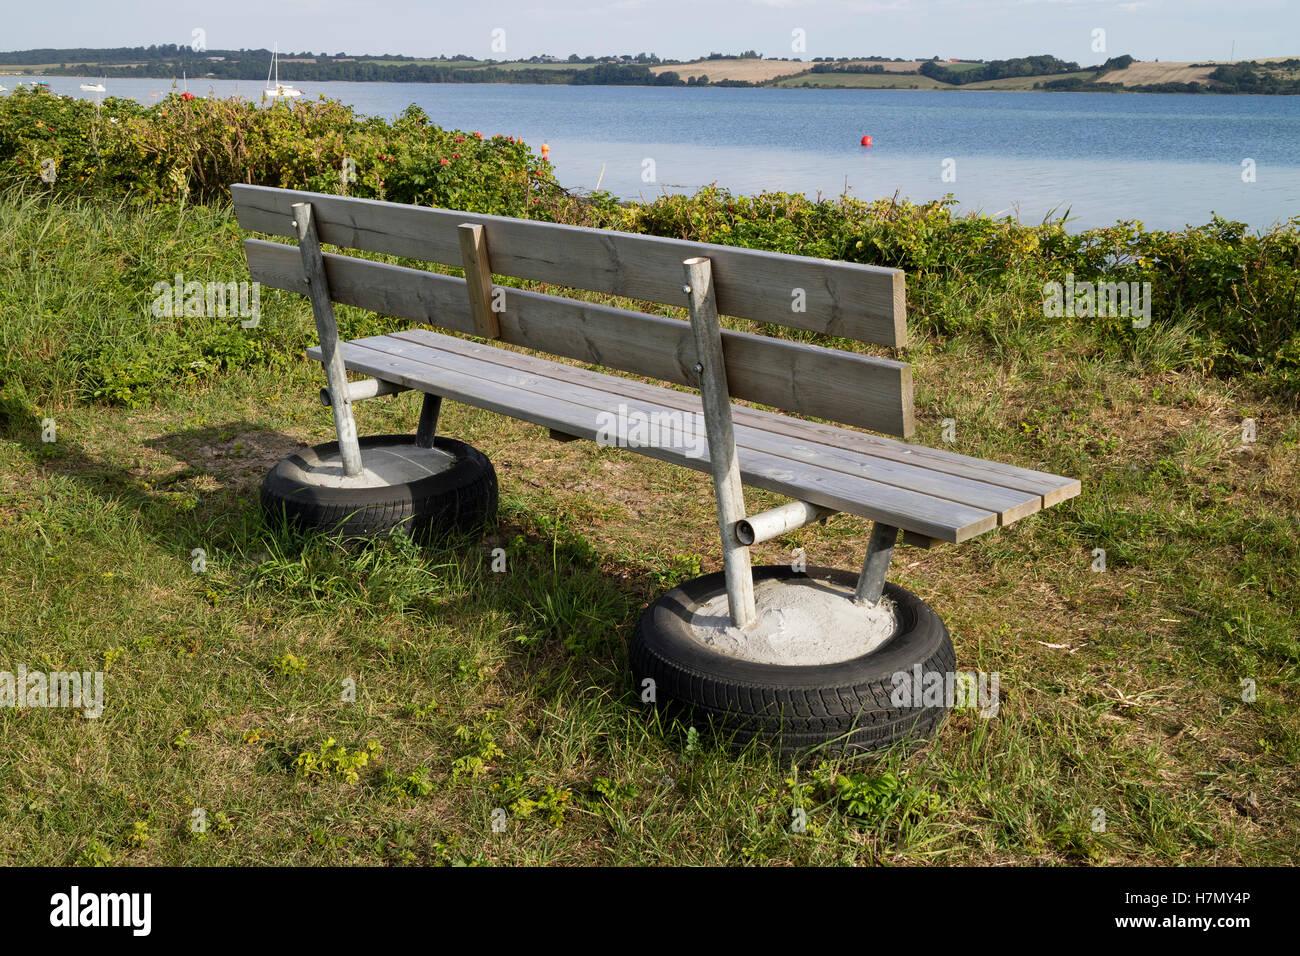 Panca su pneumatici riciclati in Broager vicino al mare, Danimarca Immagini Stock